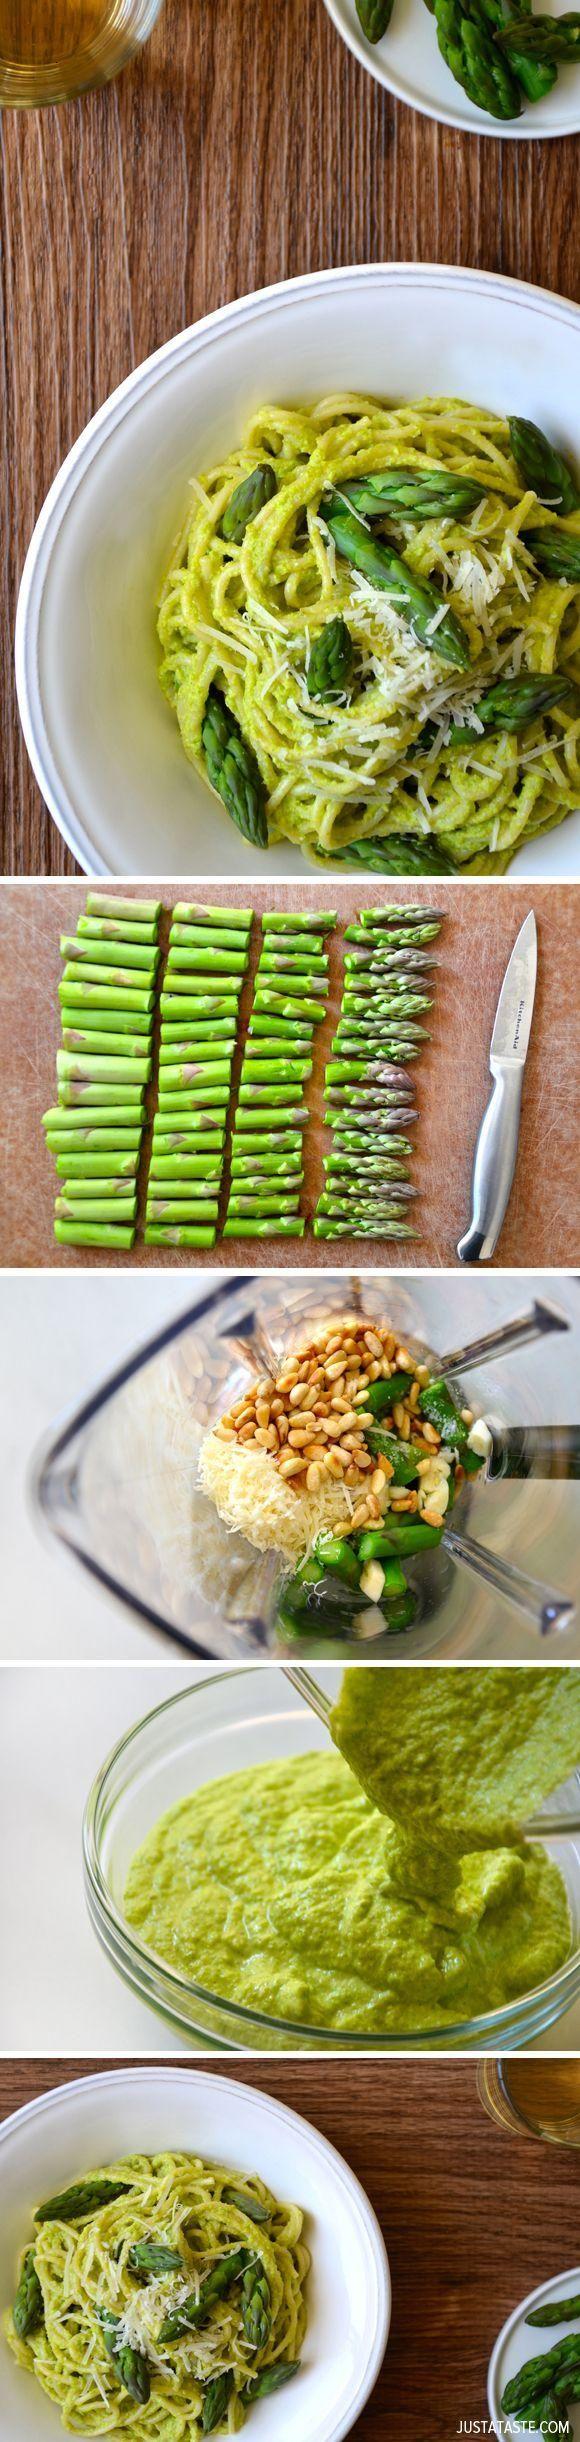 asparagus chicken pesto pasta chicken and pesto pasta asparagus pesto ...